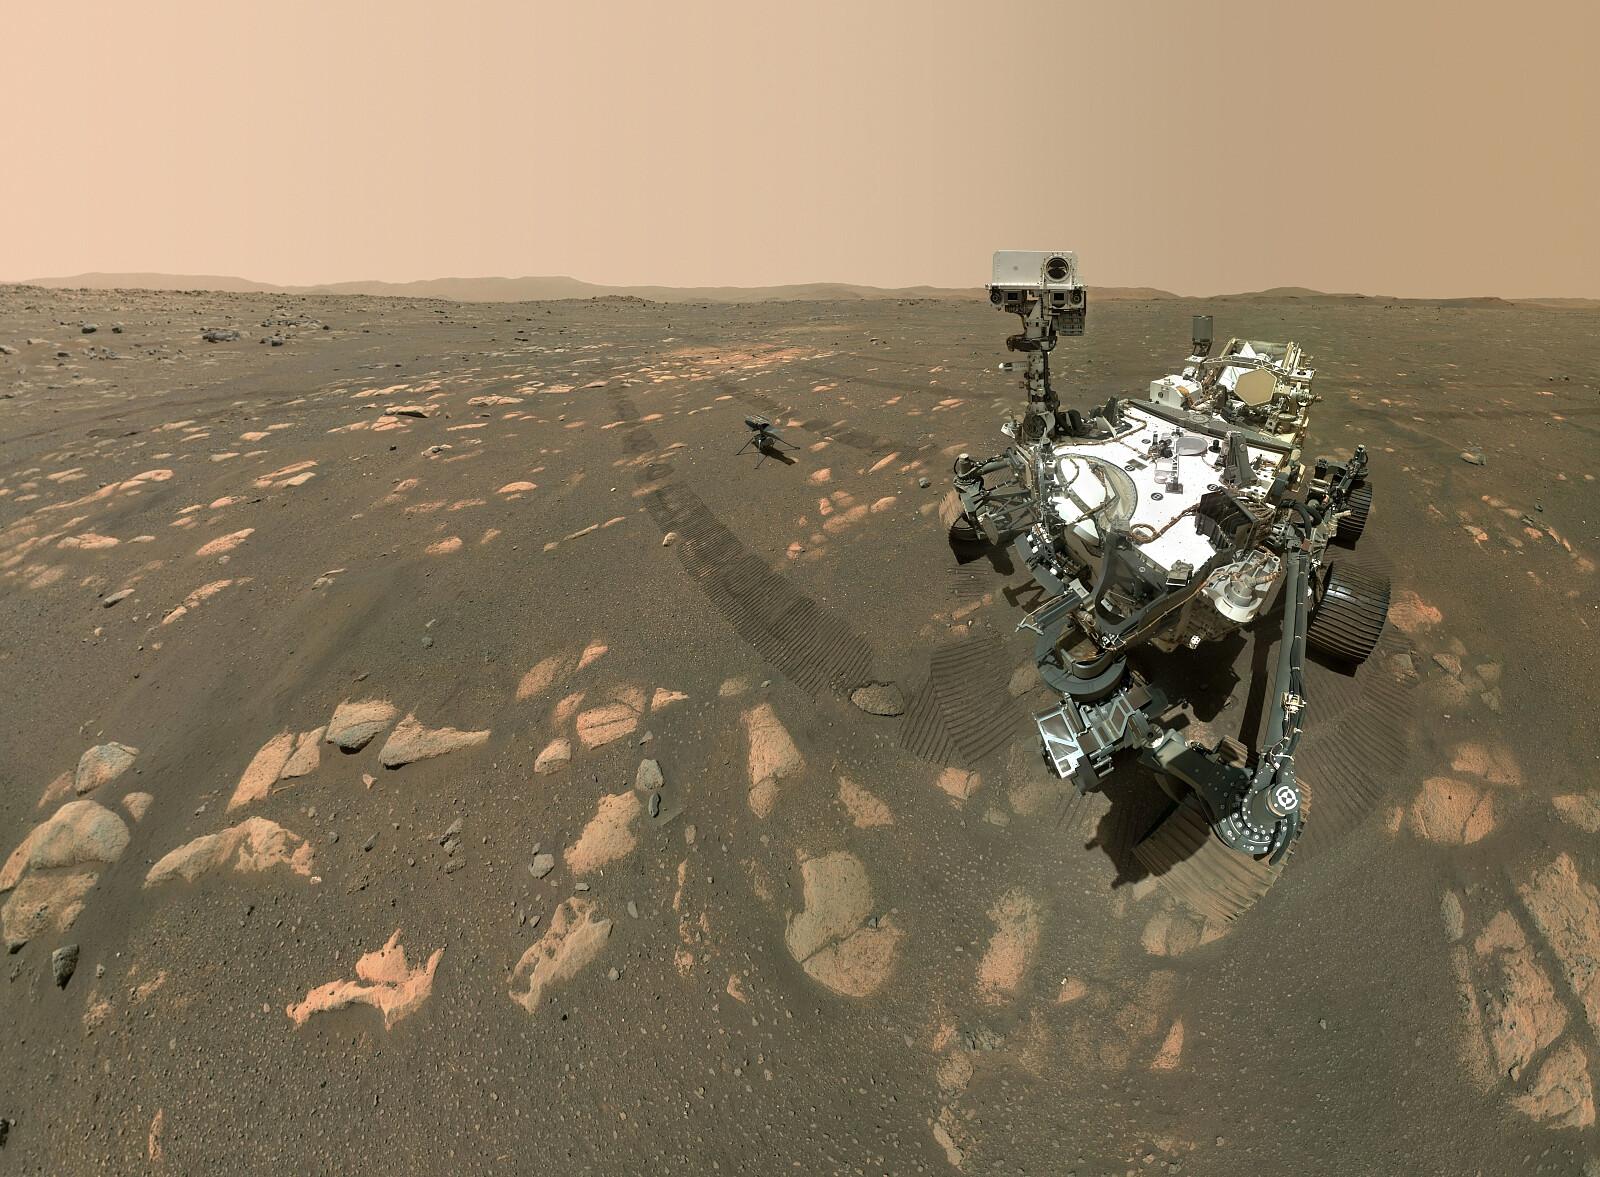 fot. PAP/EPA/NASA/JPL-Caltech/MSSS/HANDOUT / Łazik Perseverance i dron-helikopter Ingenuity